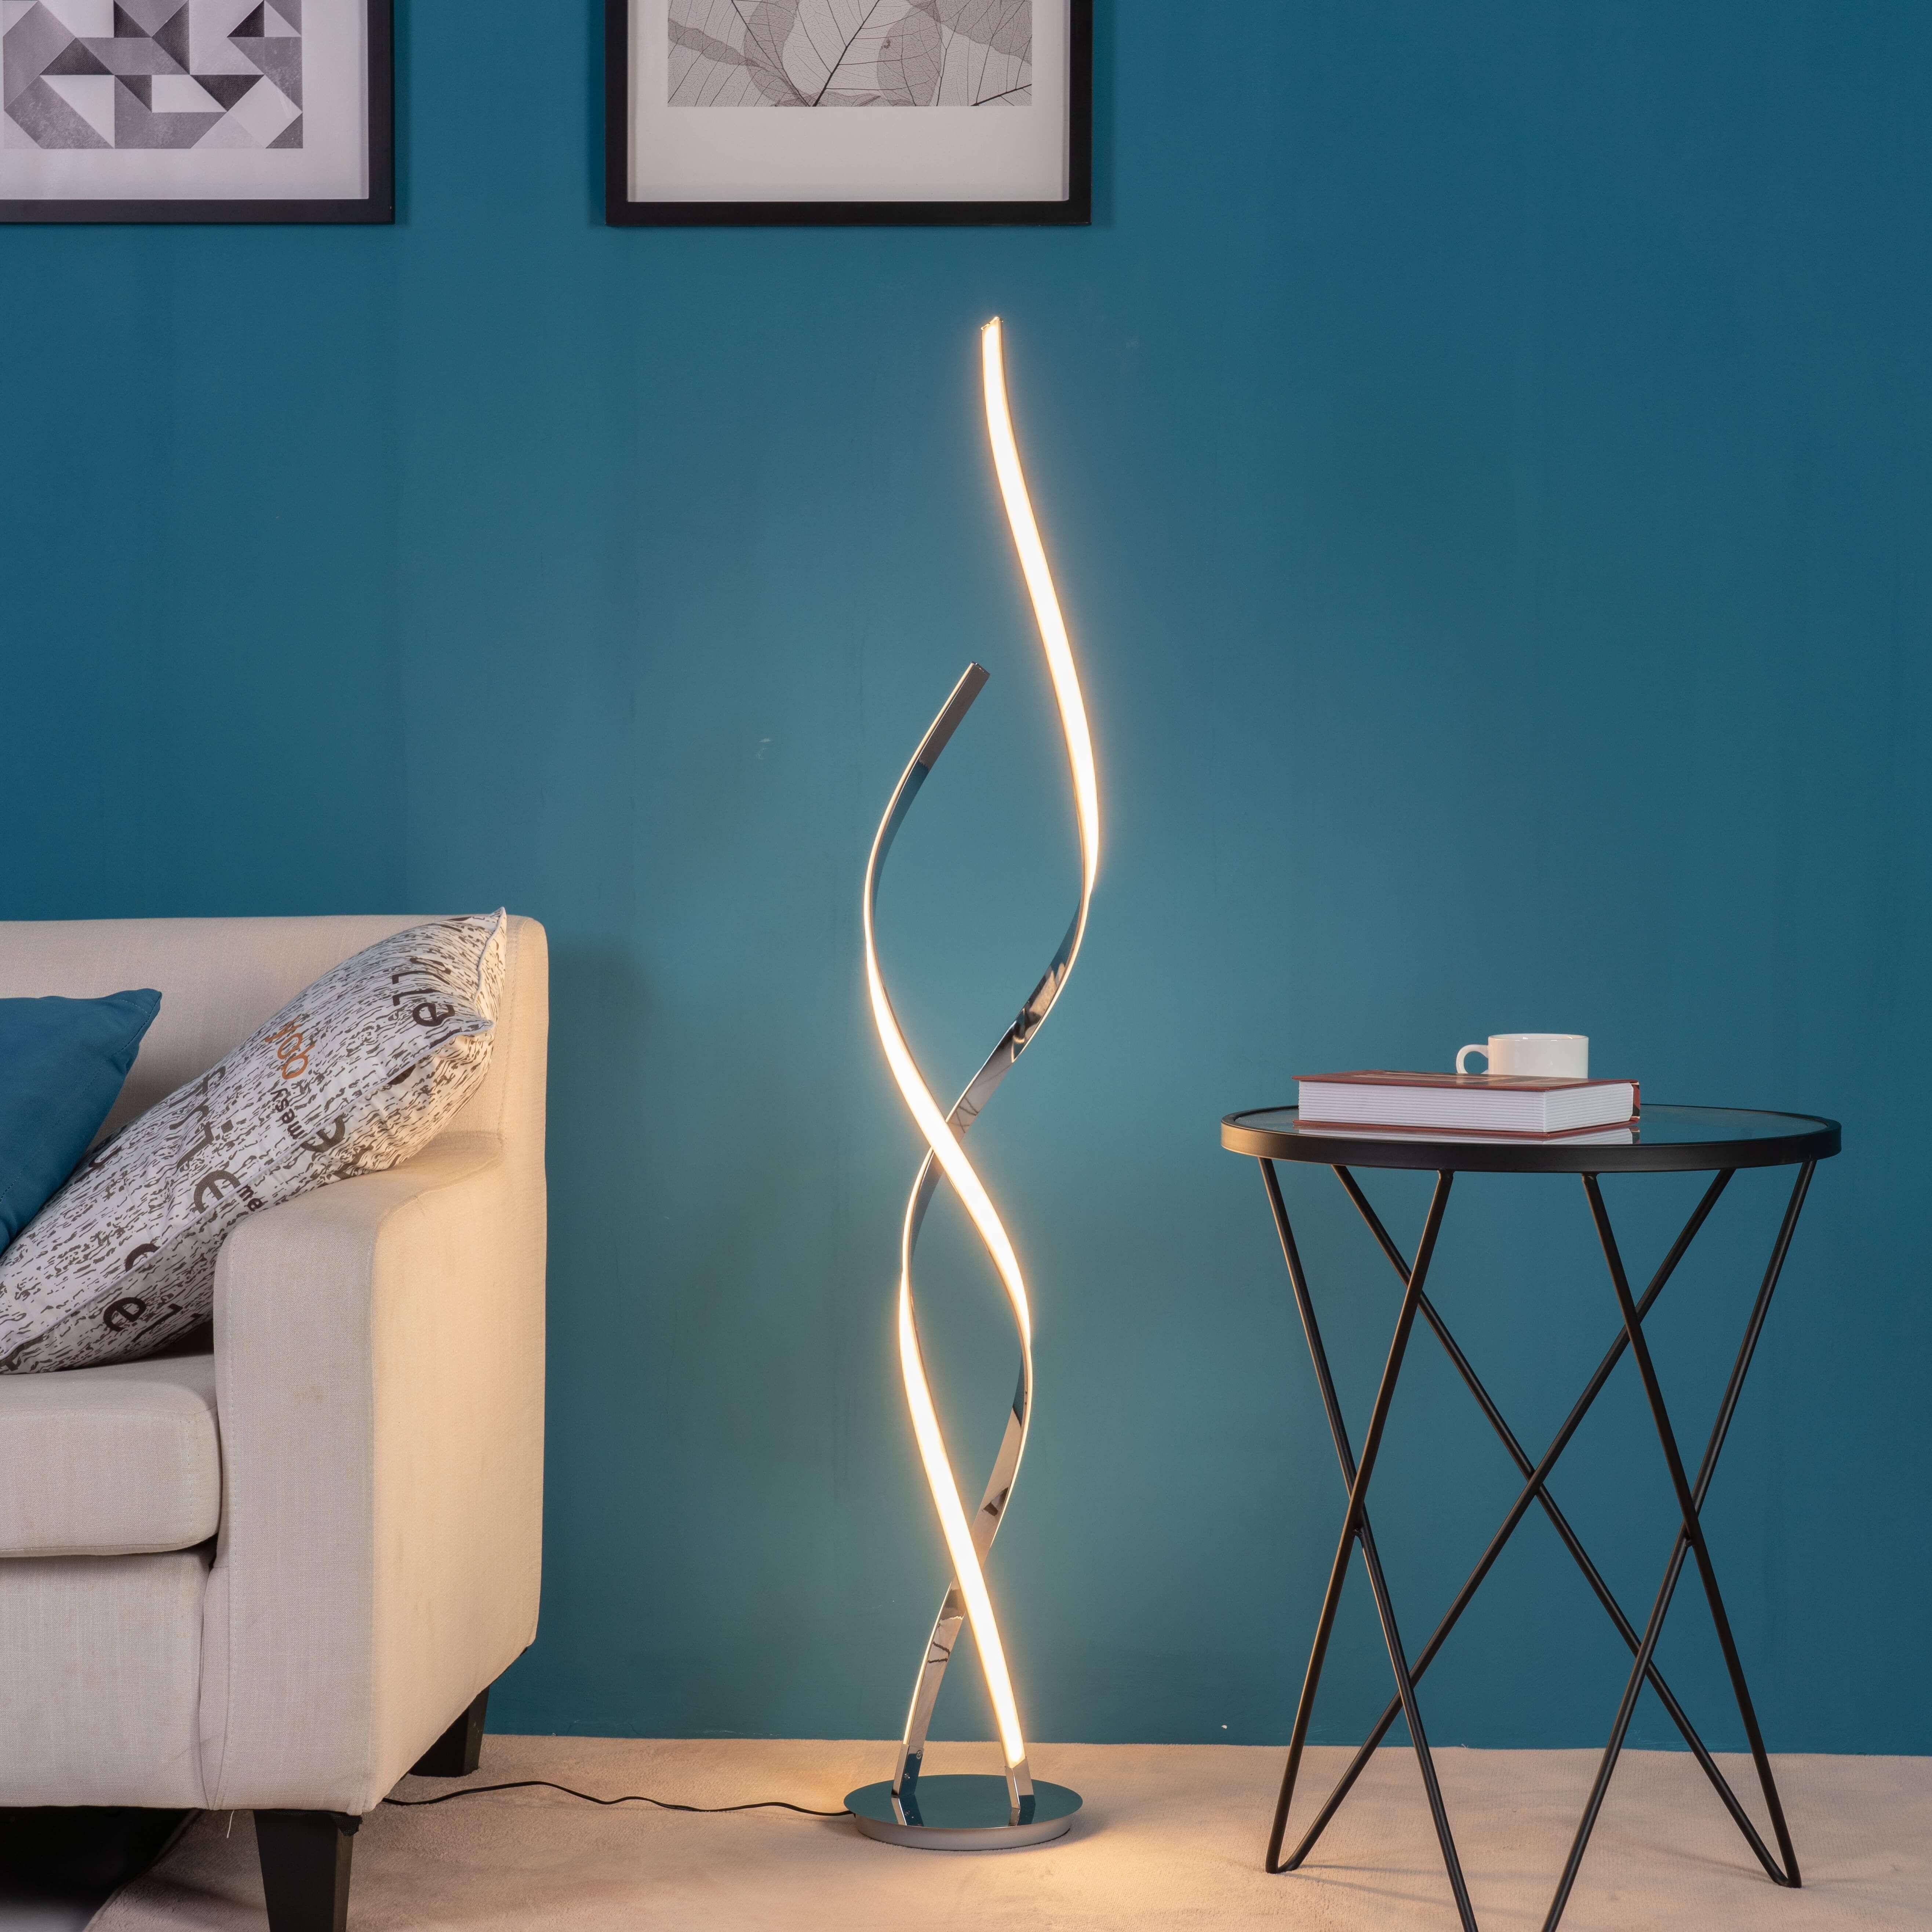 lampadaire led ultra design 24 w metal 126 cm cascada lampadaire led lampadaire design salon lampadaire